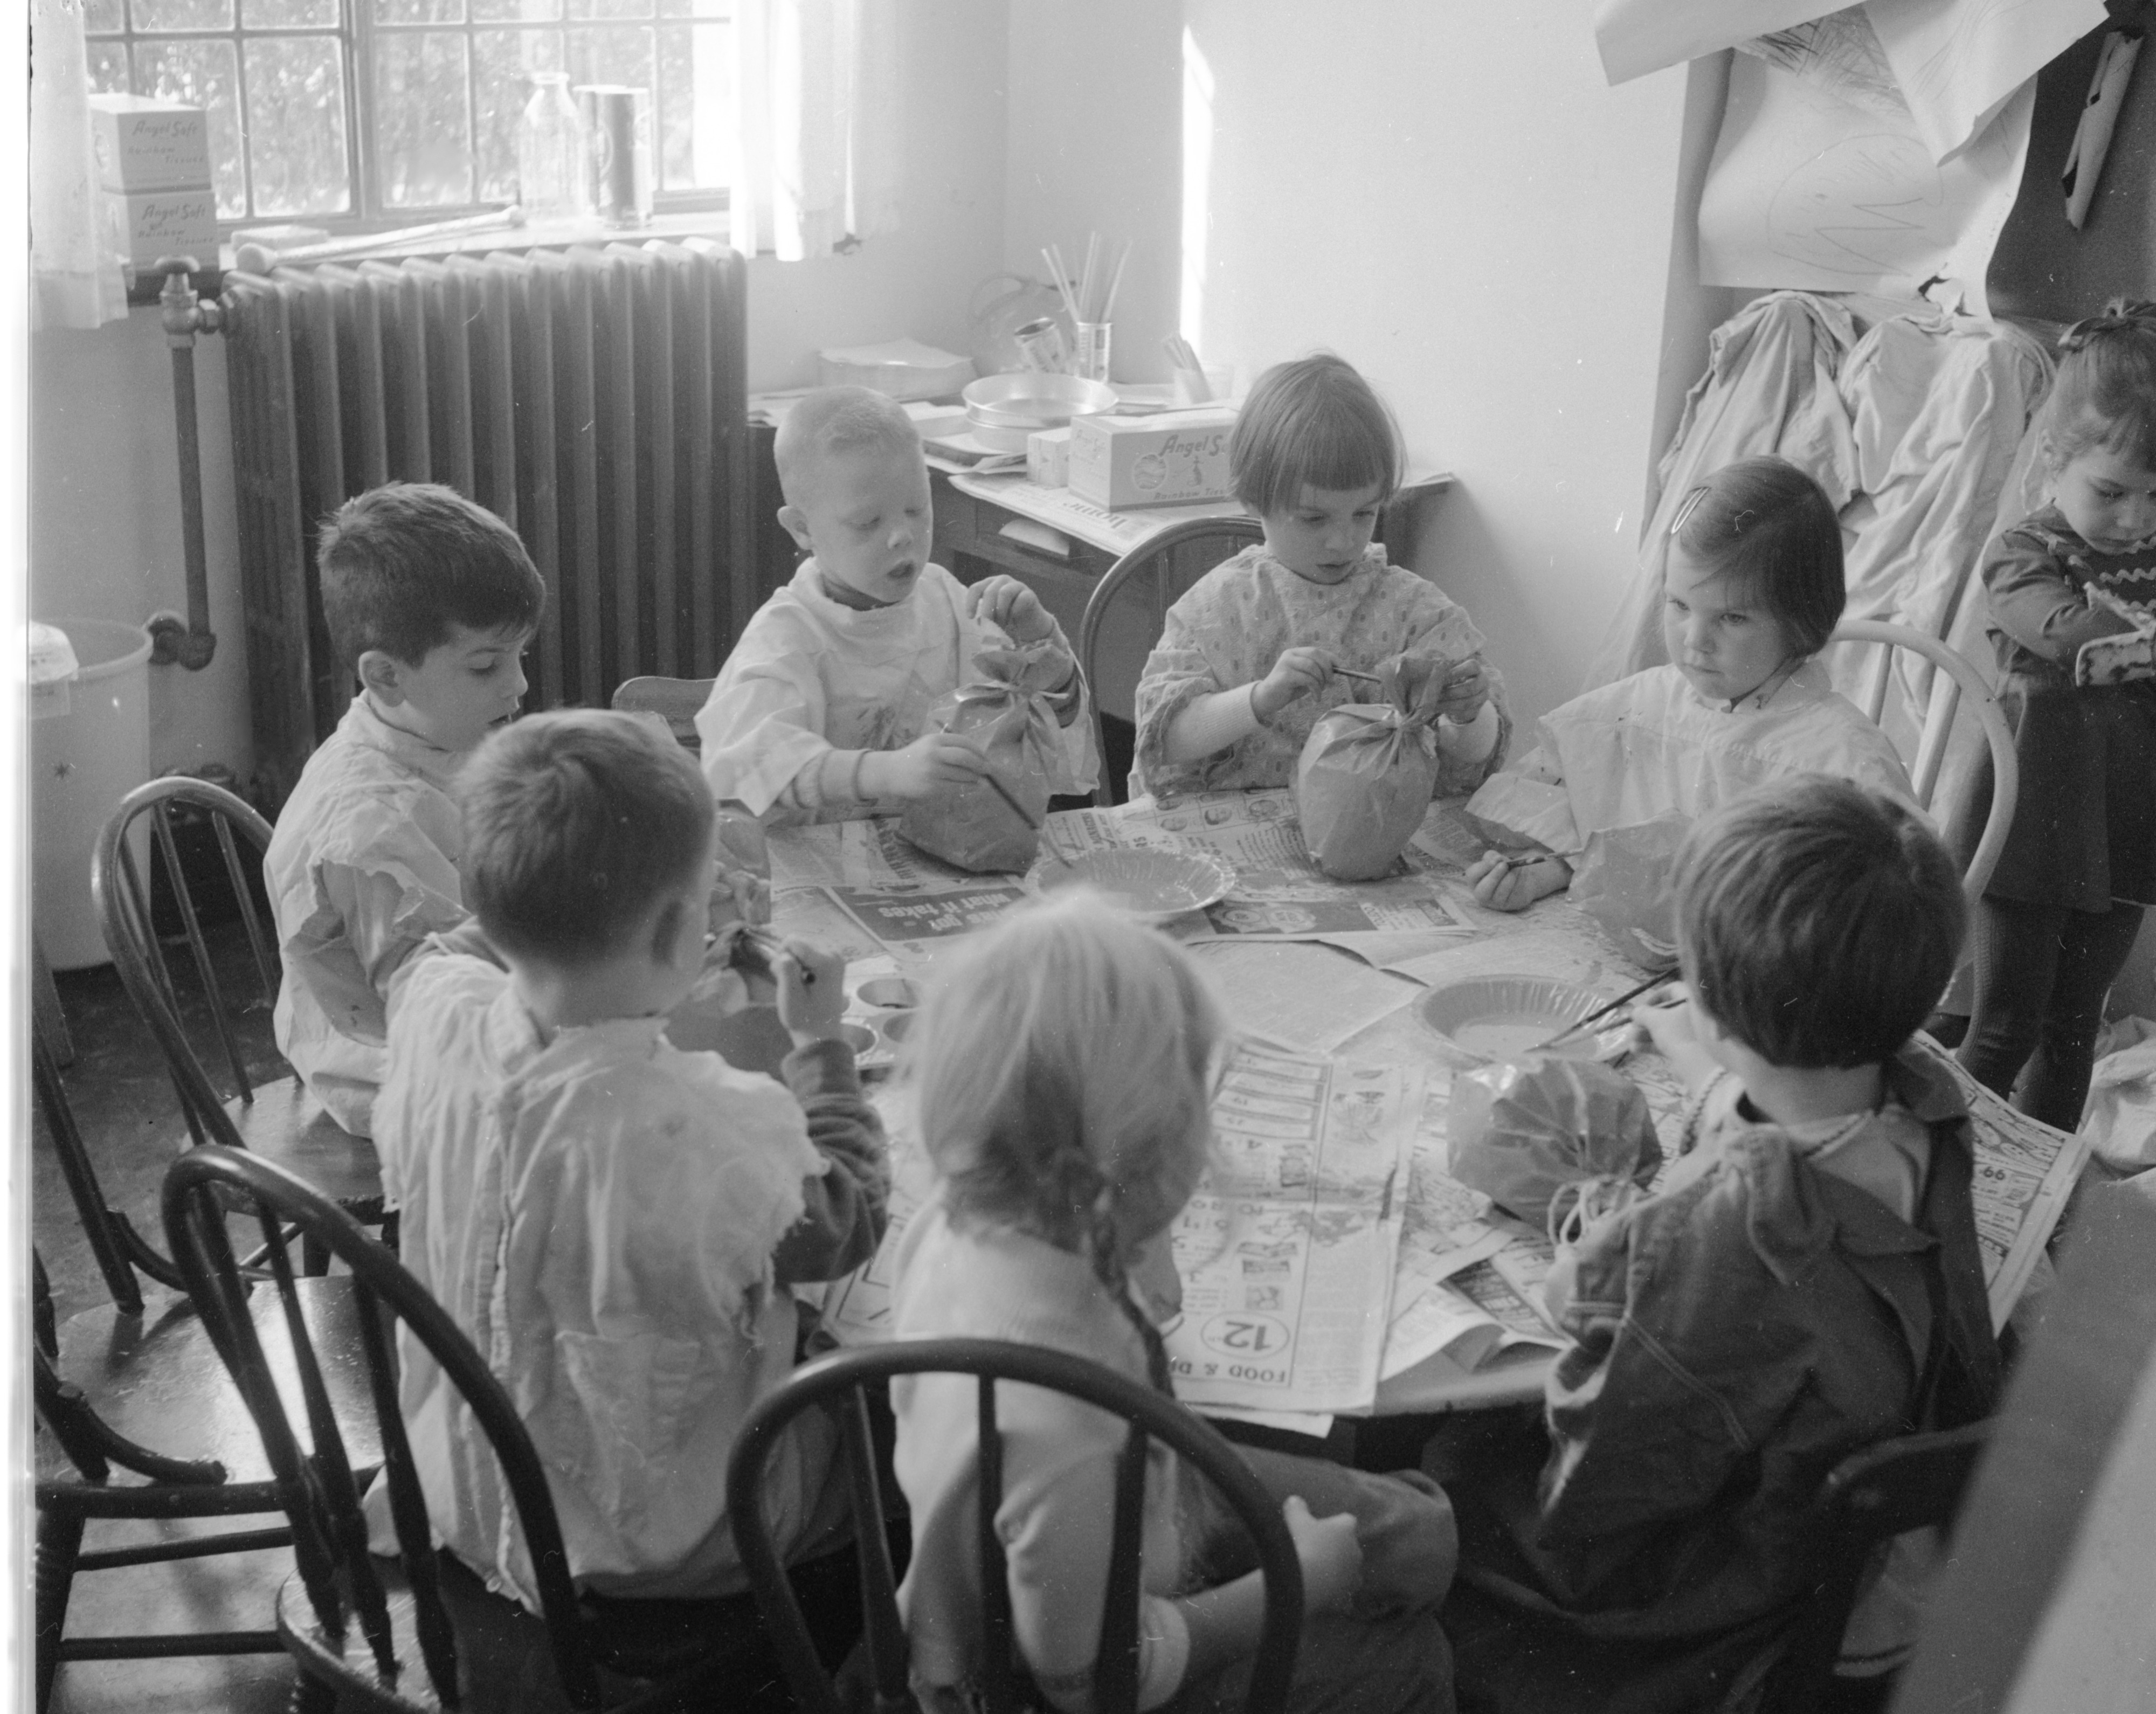 Pumpkin Painters at First Methodist Church Nursery School, October 1962 image